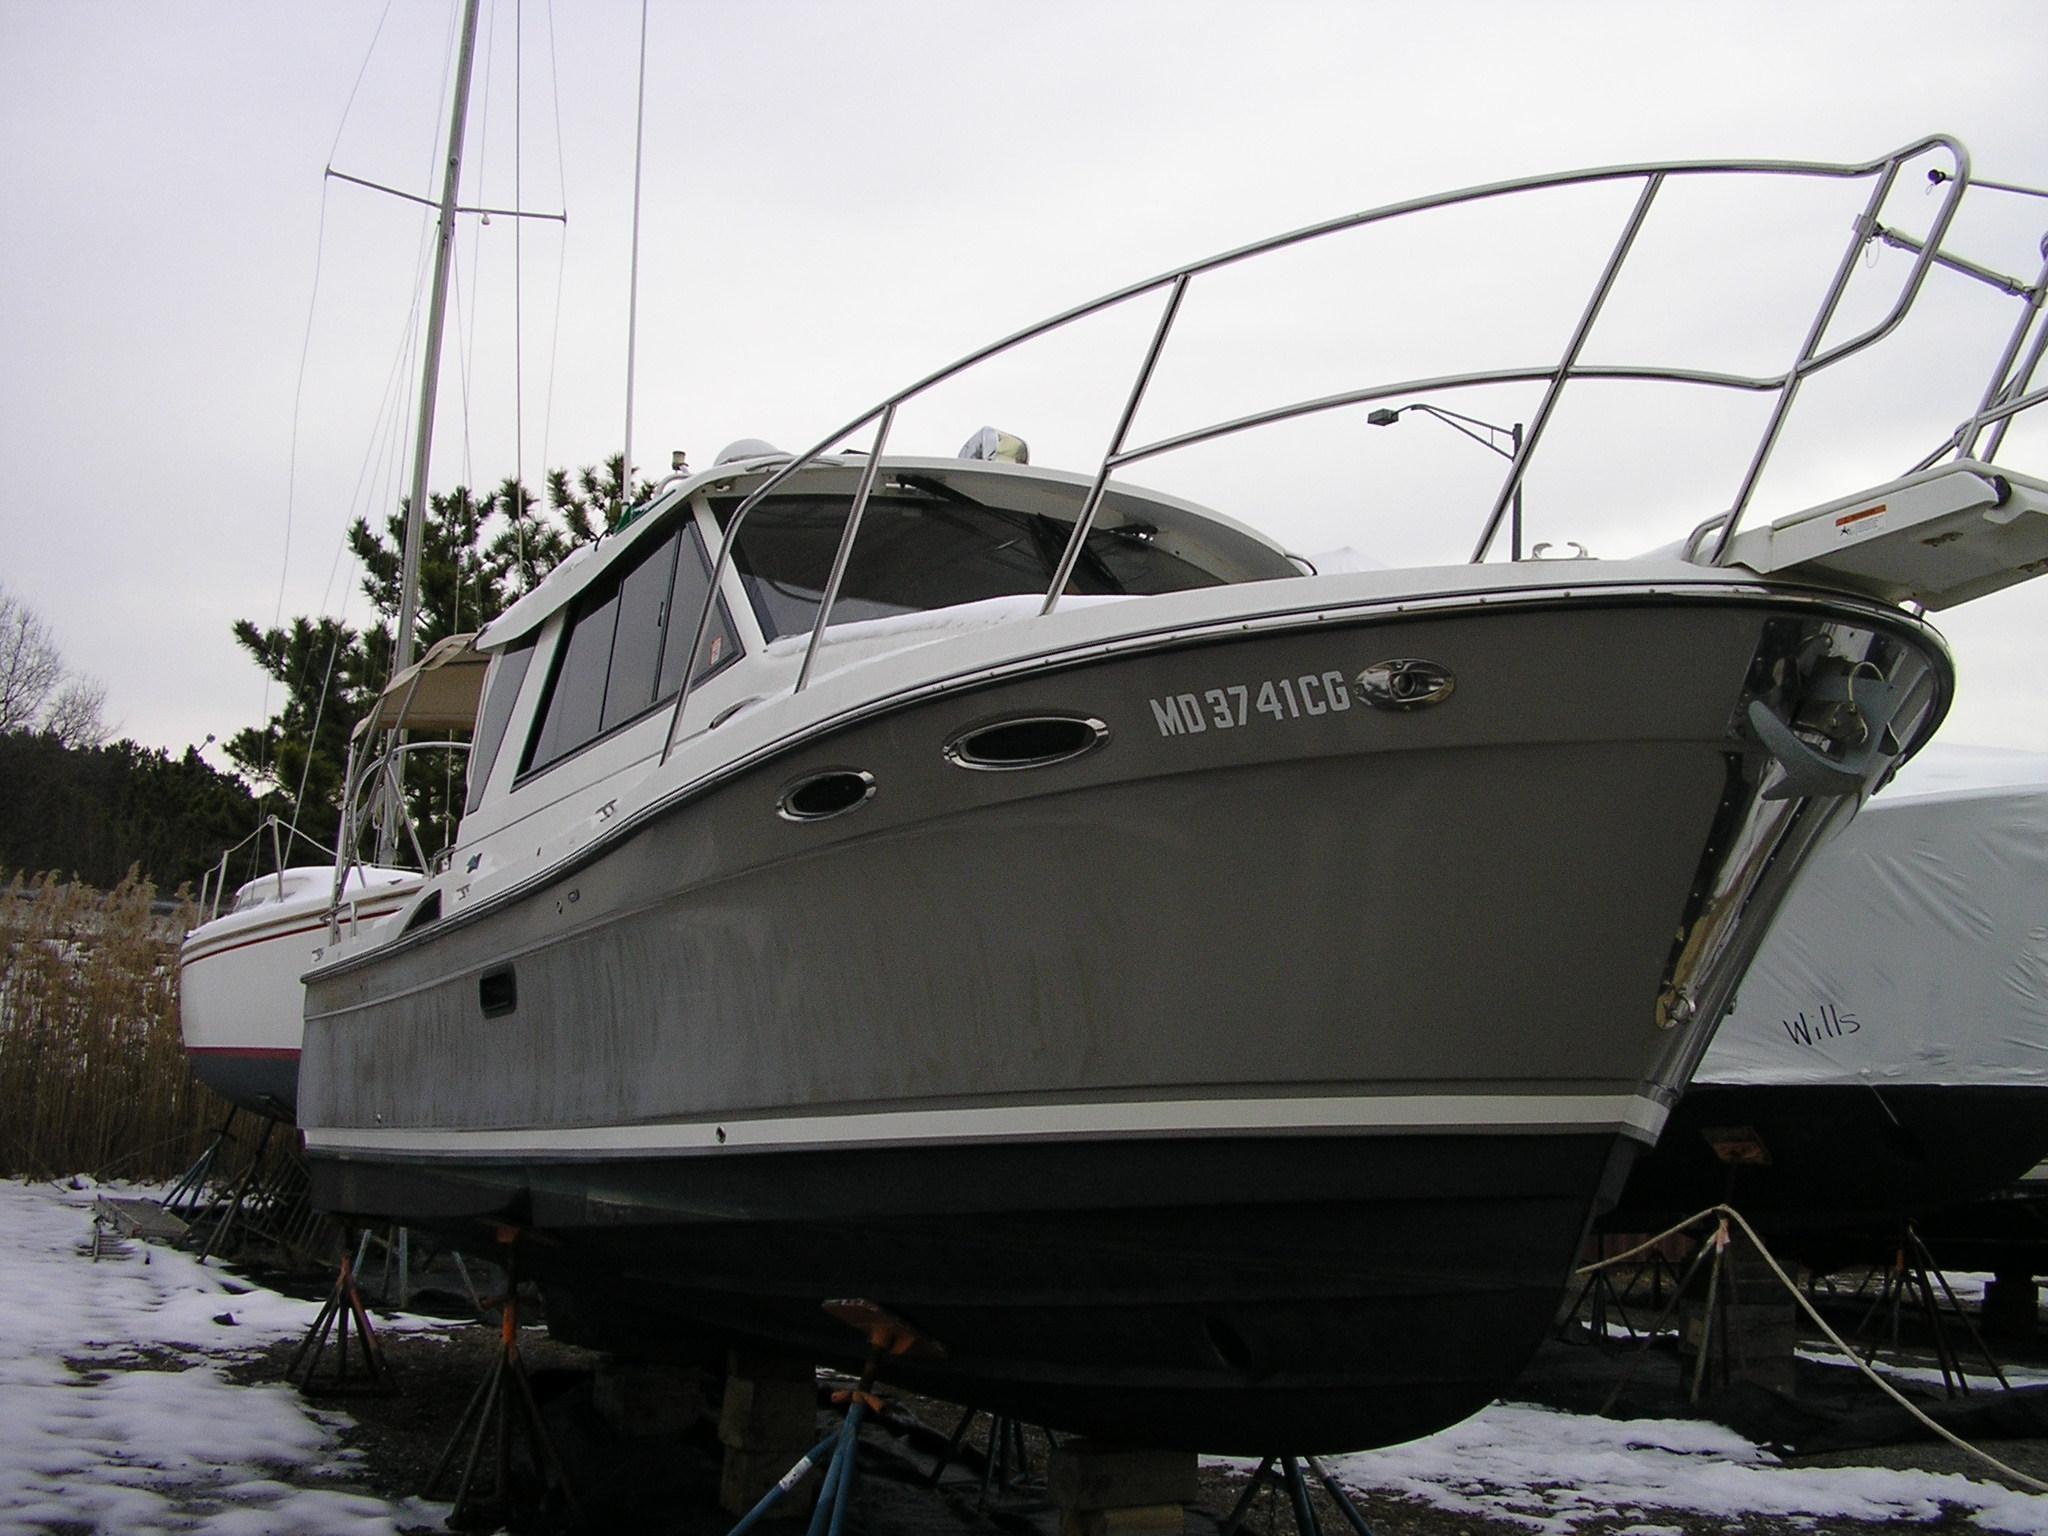 2014 Cutwater C 28 Power Boat For Sale Www Yachtworld Com